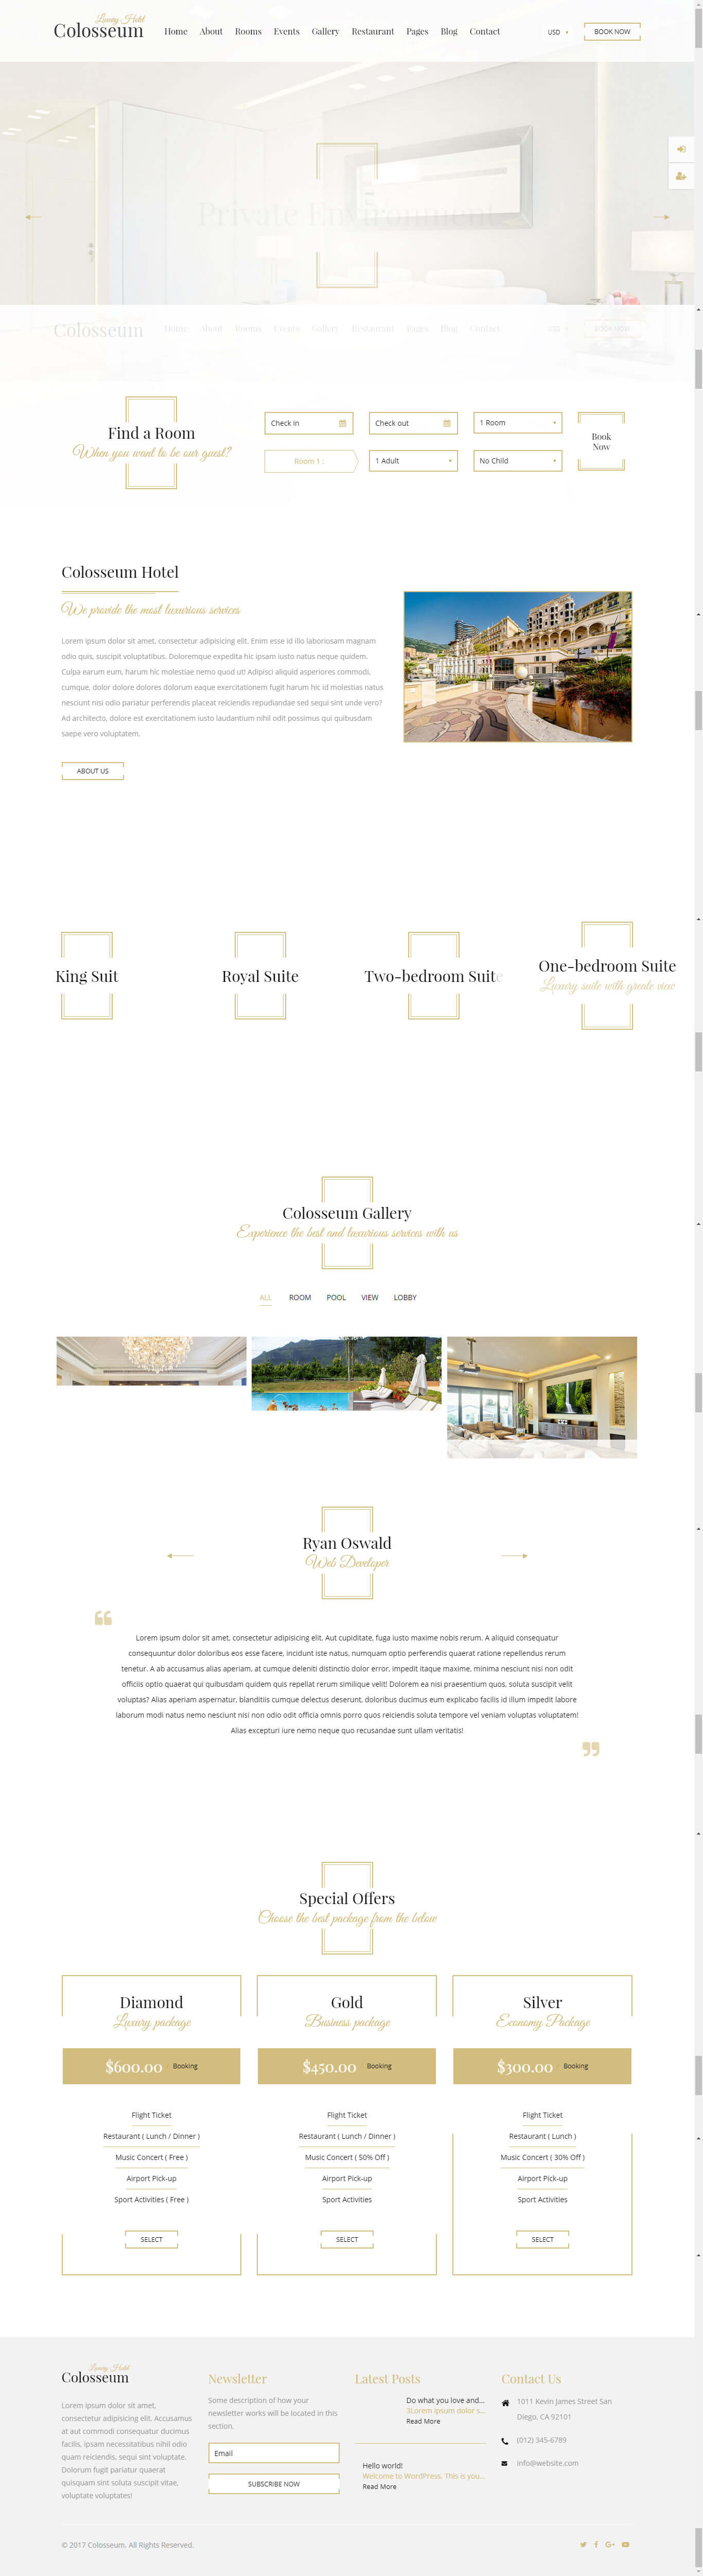 Thiết kế website resort Anh Minh